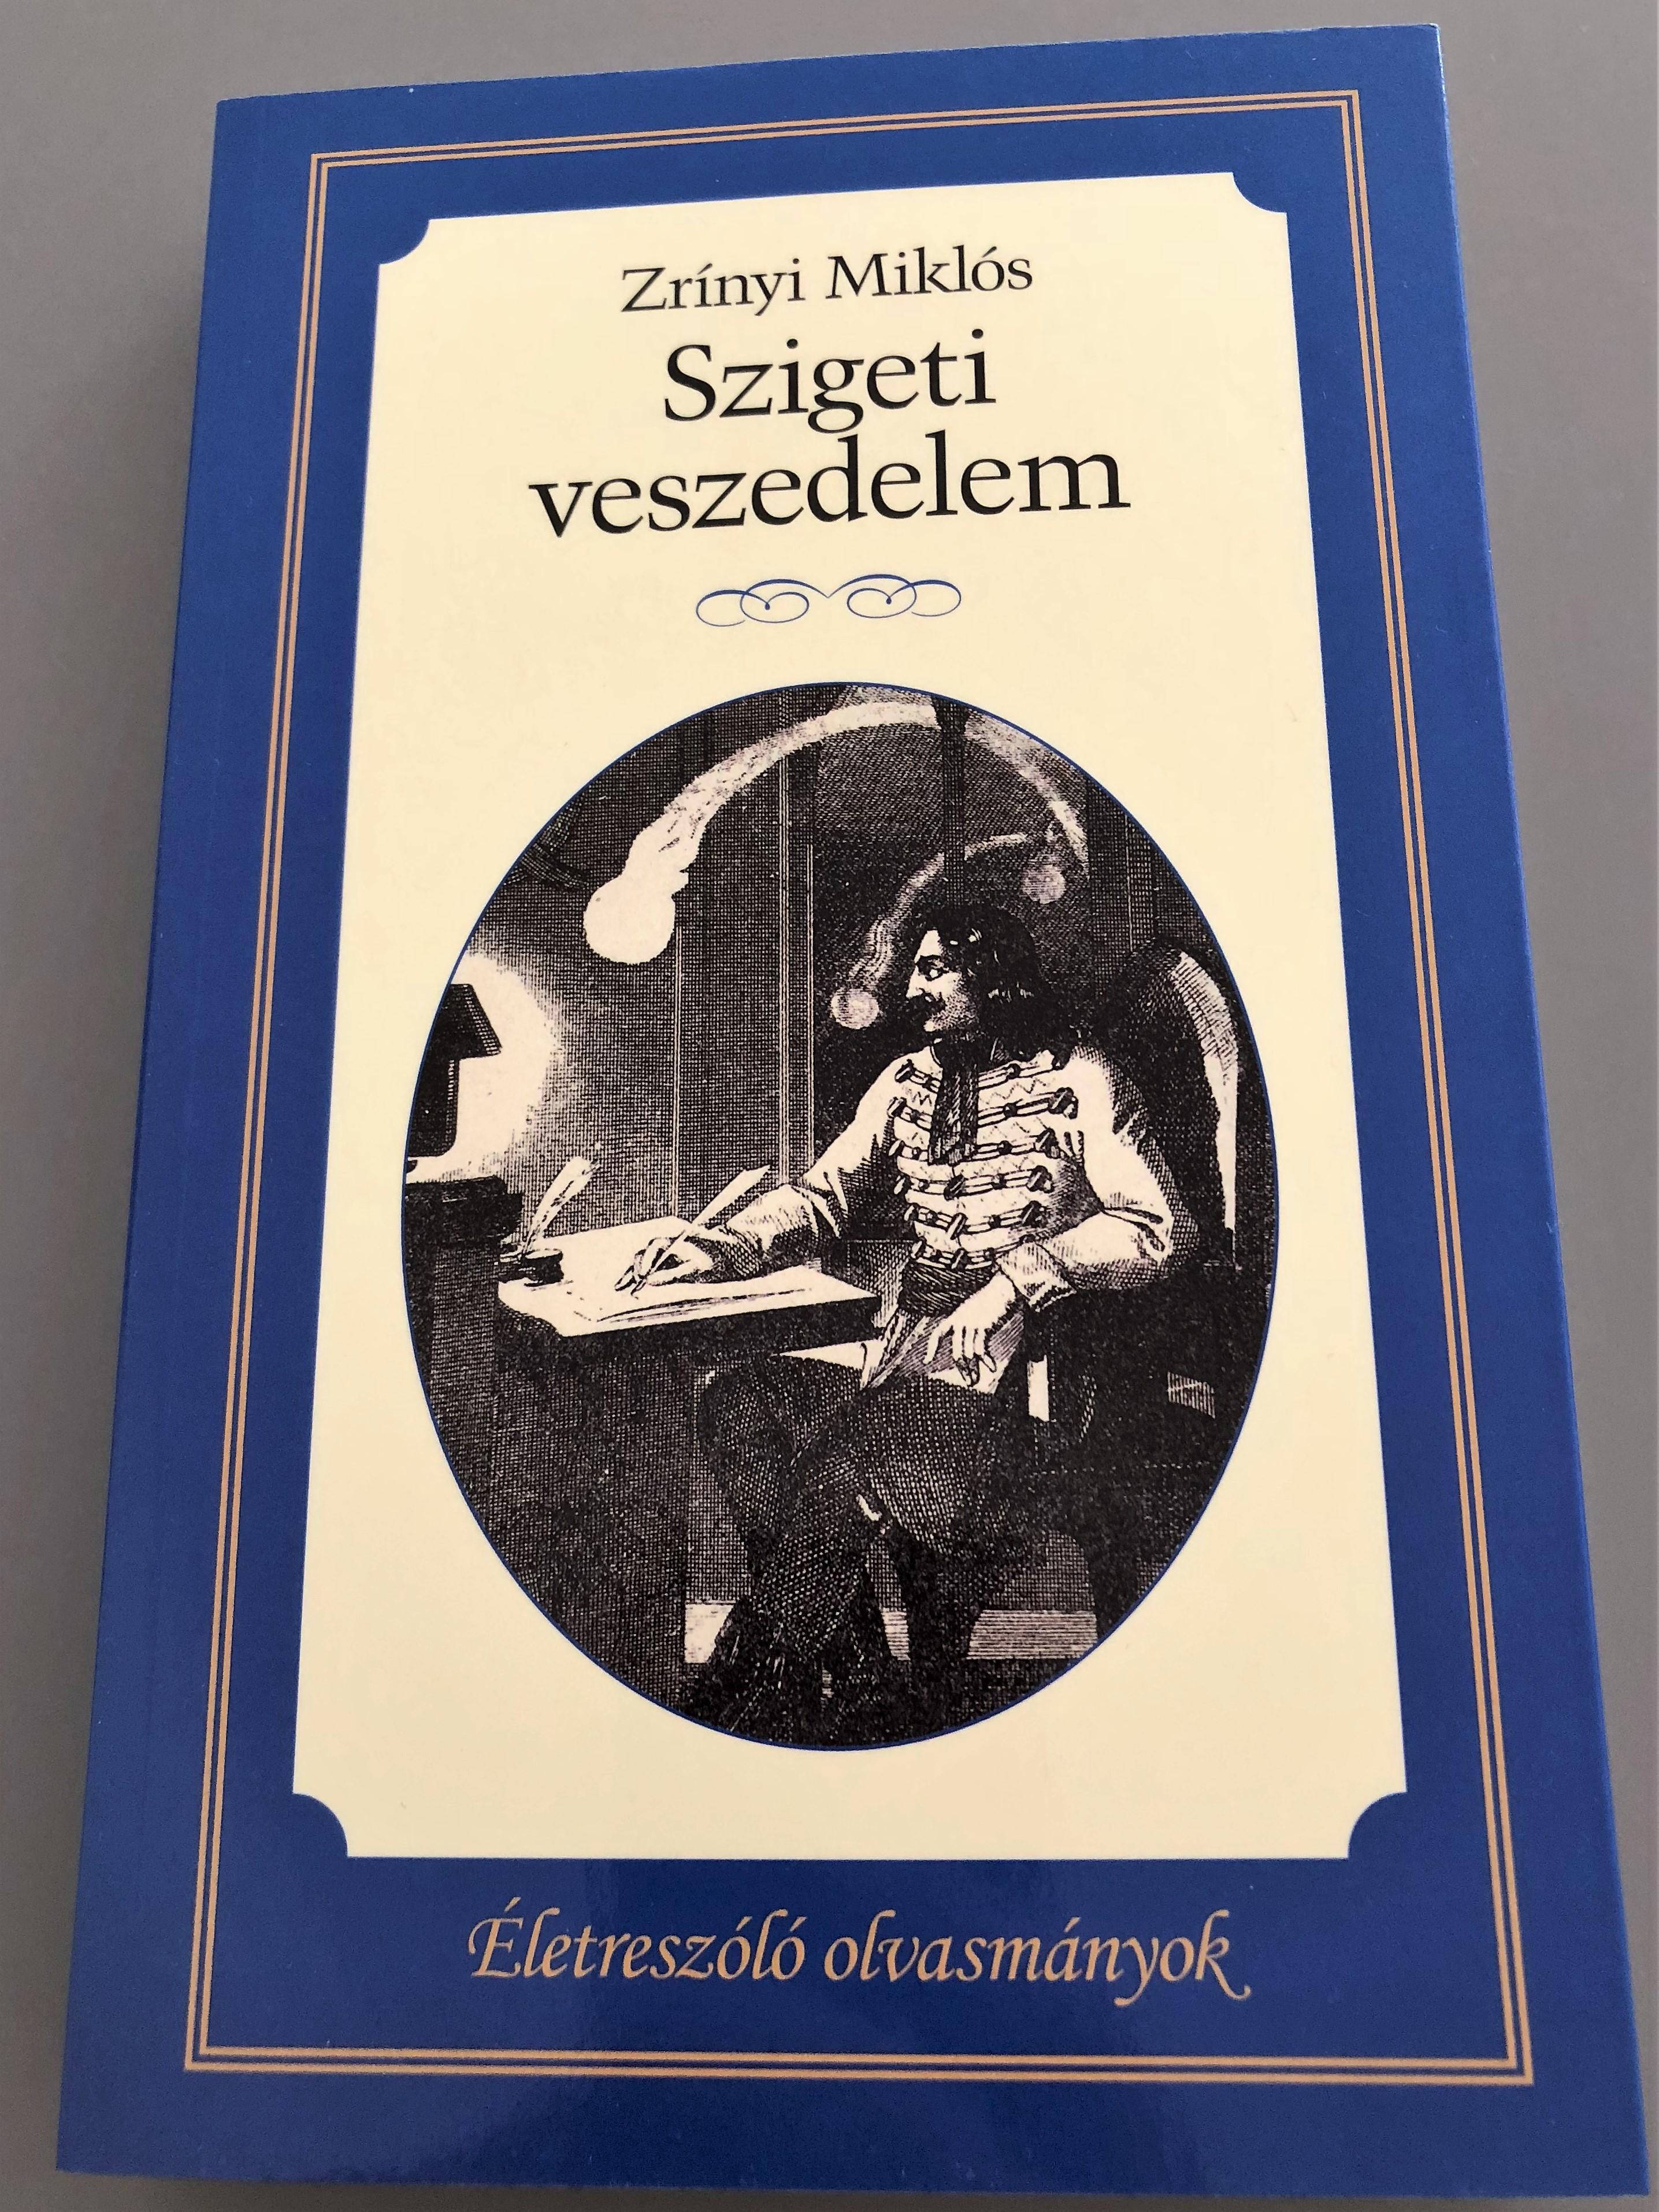 -szigeti-veszedelem-by-zr-nyi-mikl-s-letresz-l-olvasm-nyok-the-siege-of-sziget-hungarian-epic-poem-kossuth-kiad-2017-paperback-1-.jpg